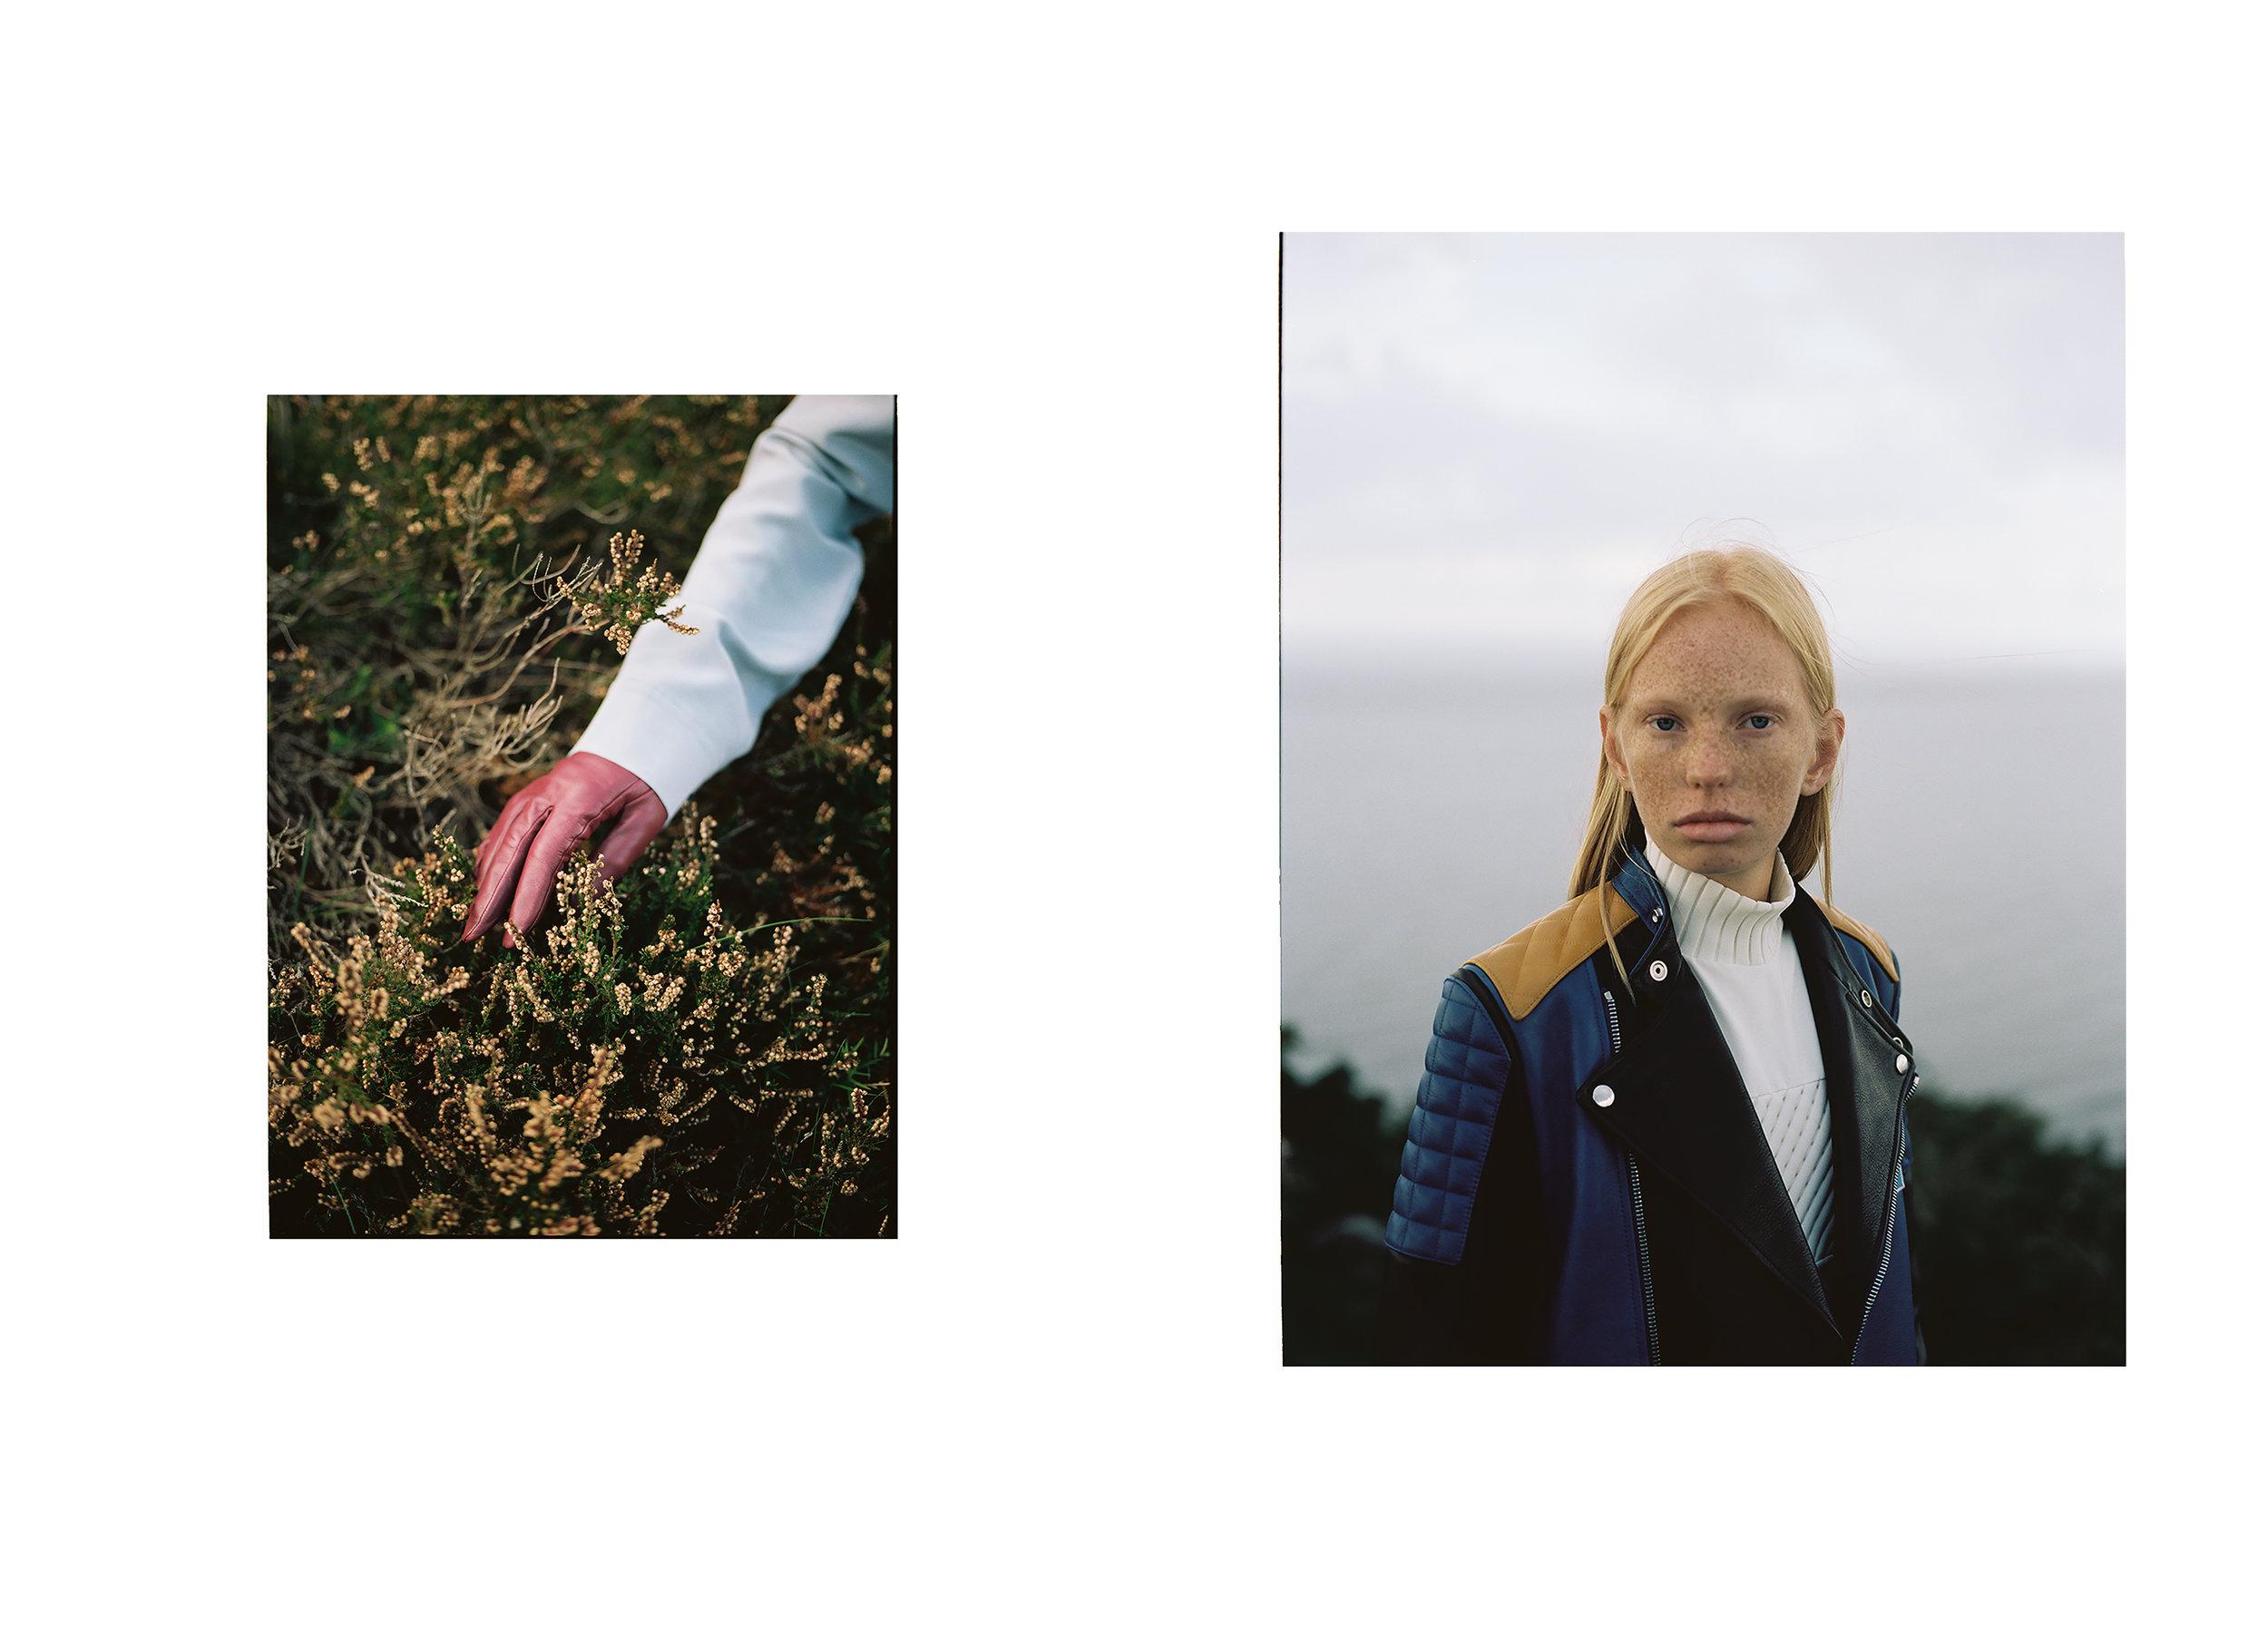 Gloves: Filippa K; Shirt:COS;Jacket: Acne Studios; Turtleneck: Courrèges